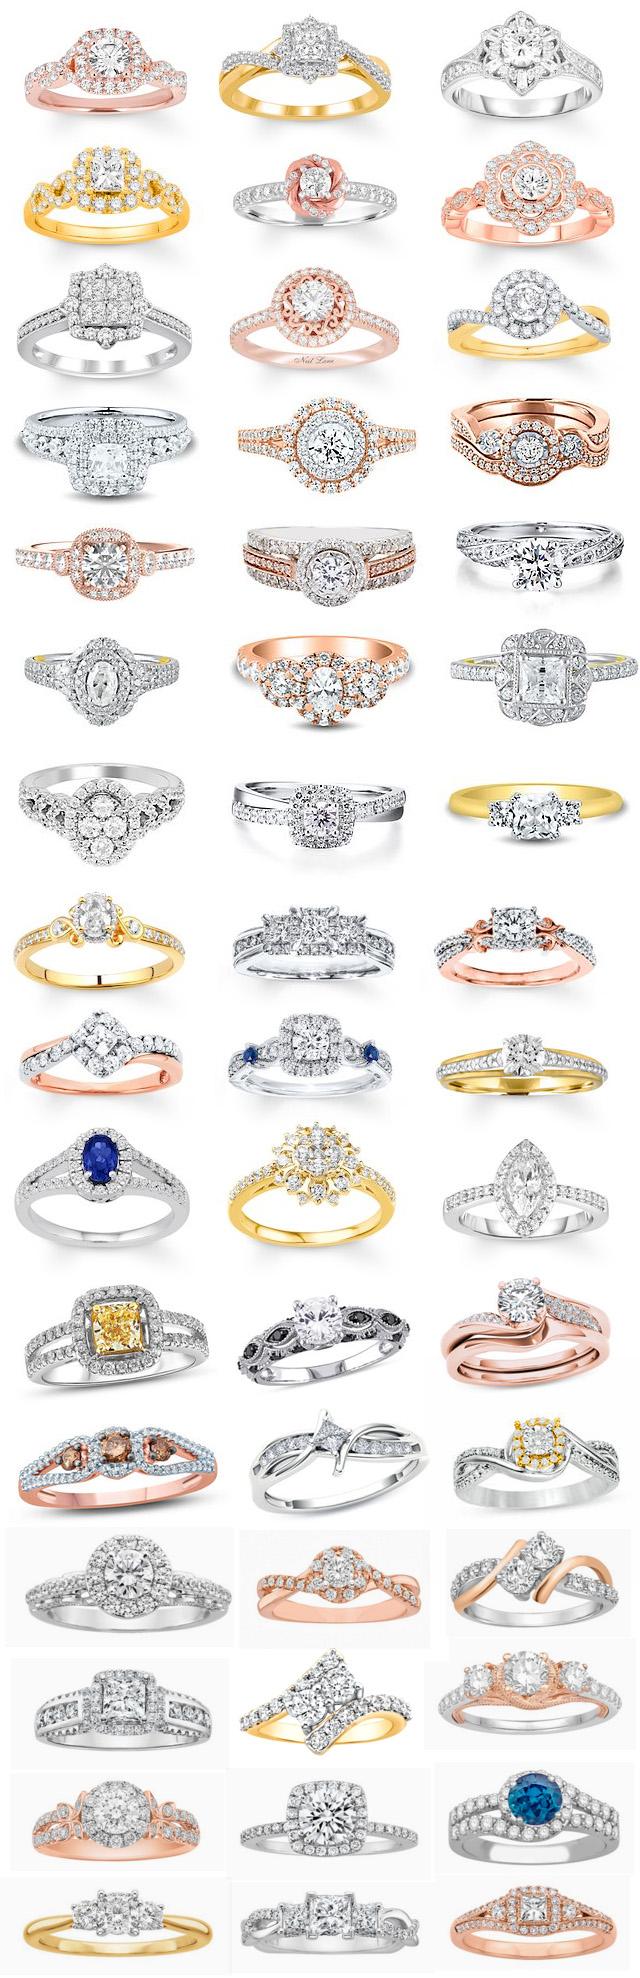 Millennials Diamond Ring Shopping